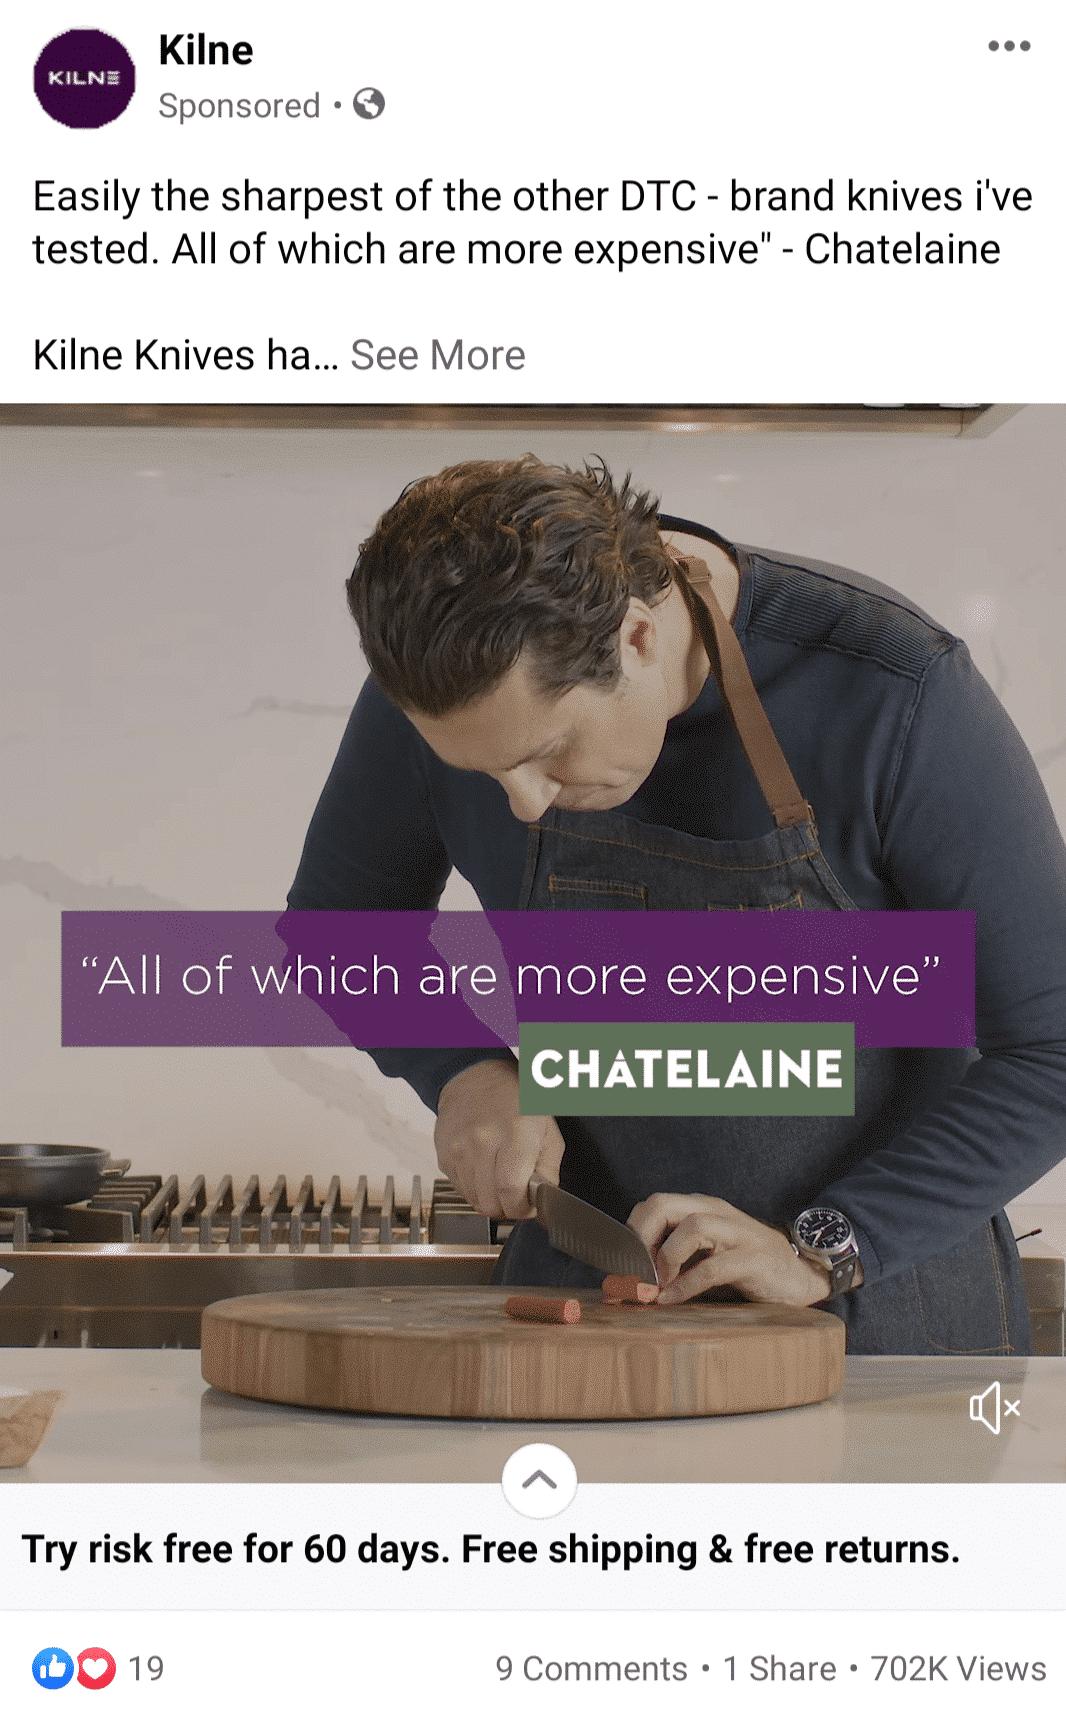 Kilne instant experience ads